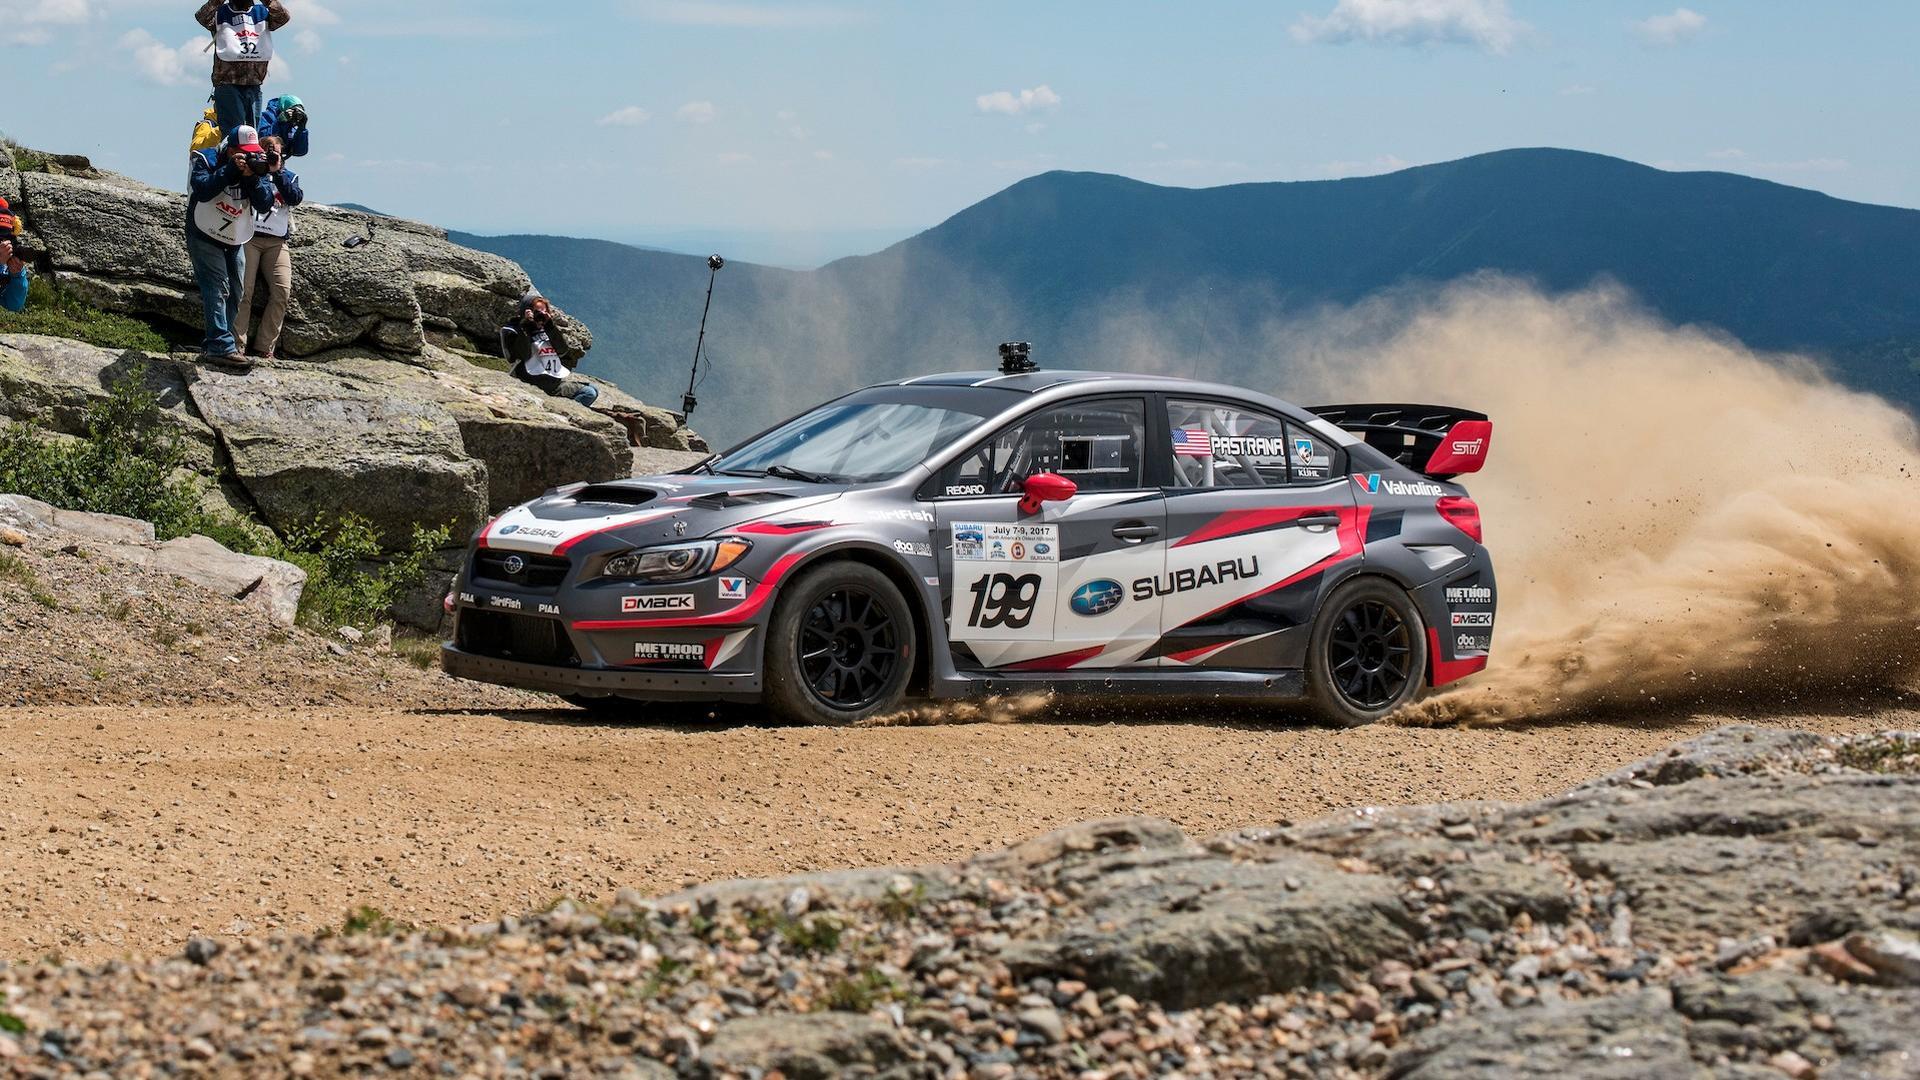 Dirt Rally Subaru Impreza WRX STI Travis Pastrana - YouTube